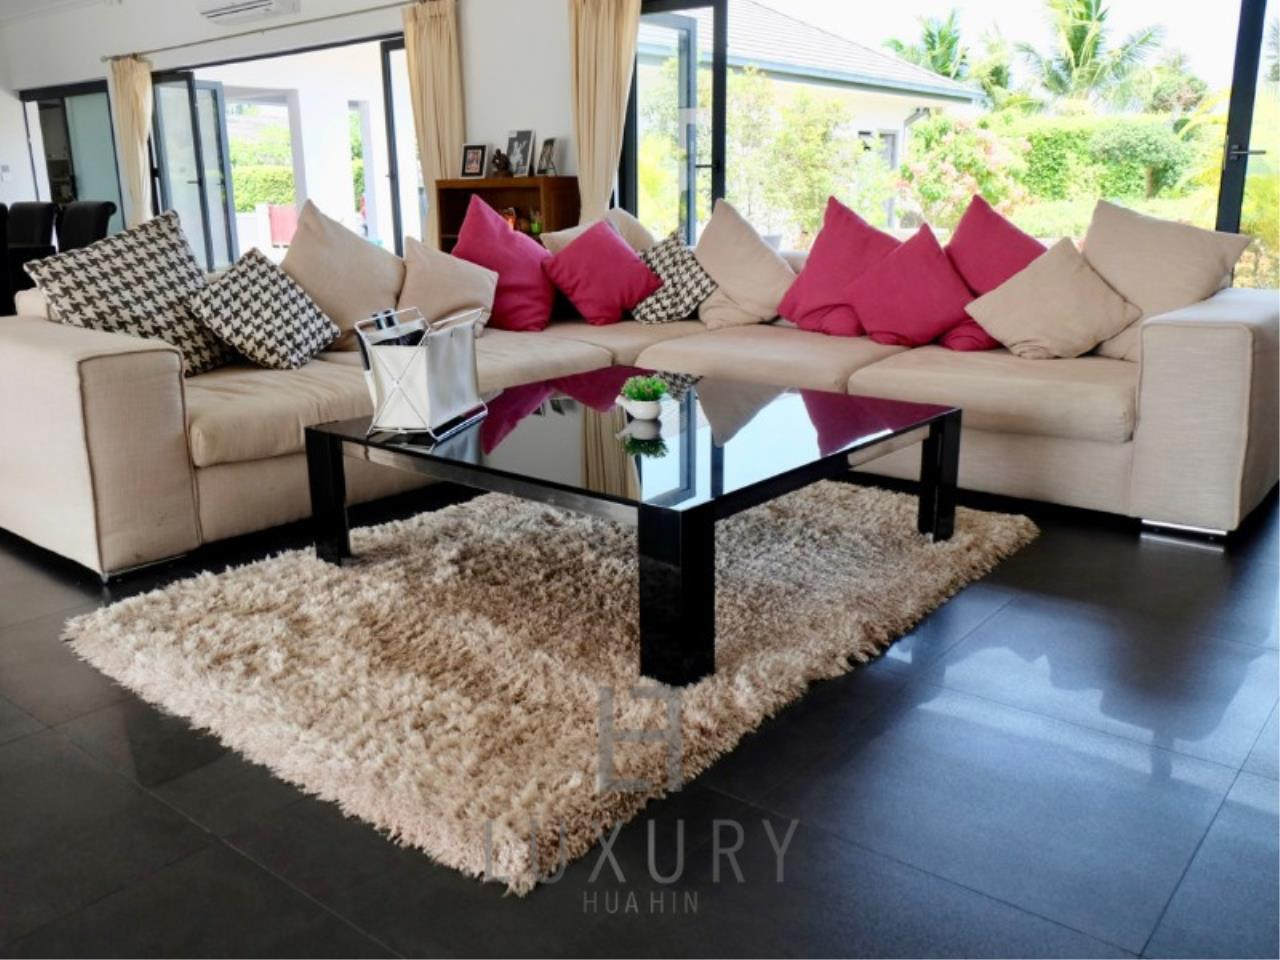 Luxury Hua Hin Property Agency's Stunning 6 Bedroom Pool Villa on 2 Rai of Land 19